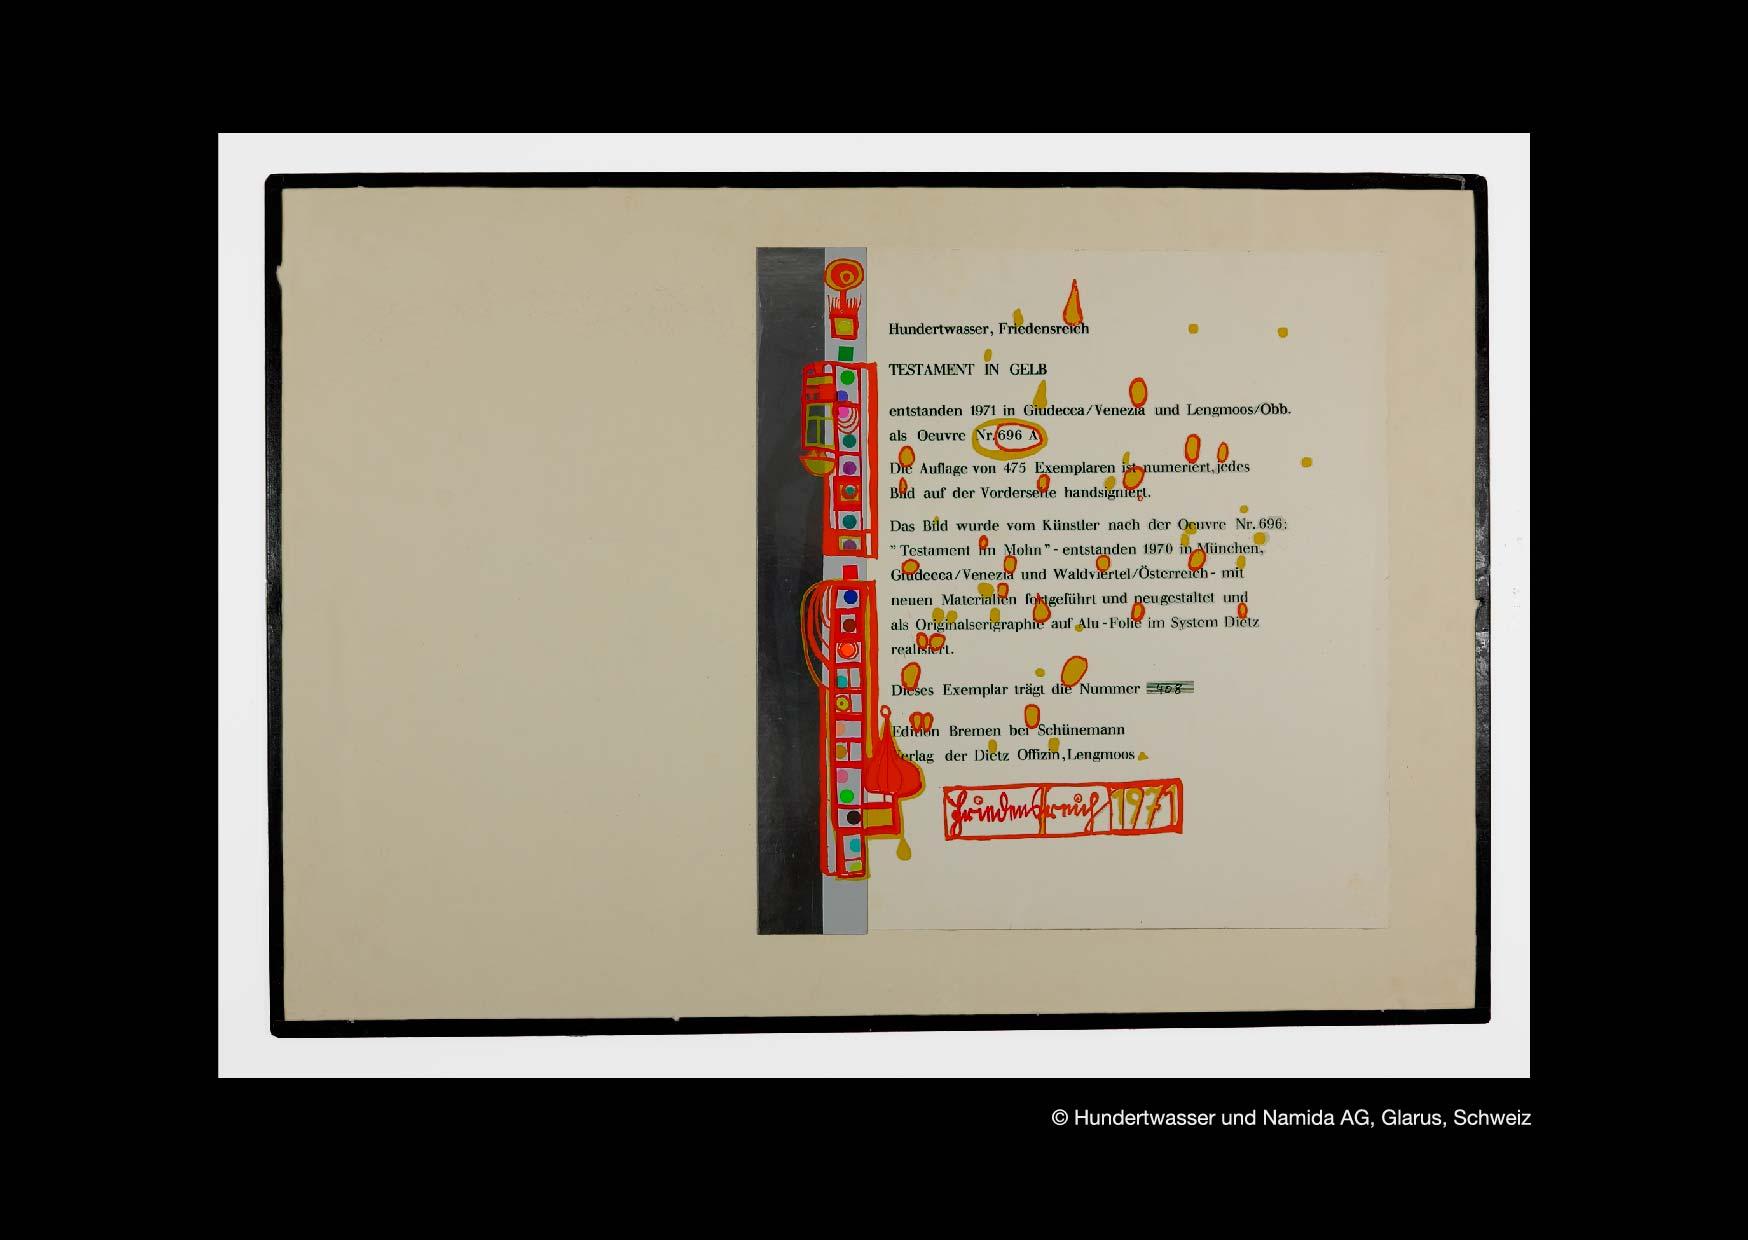 Hundertwasser Testament In Gelb HWG 43 Rene Bernhard Fineart